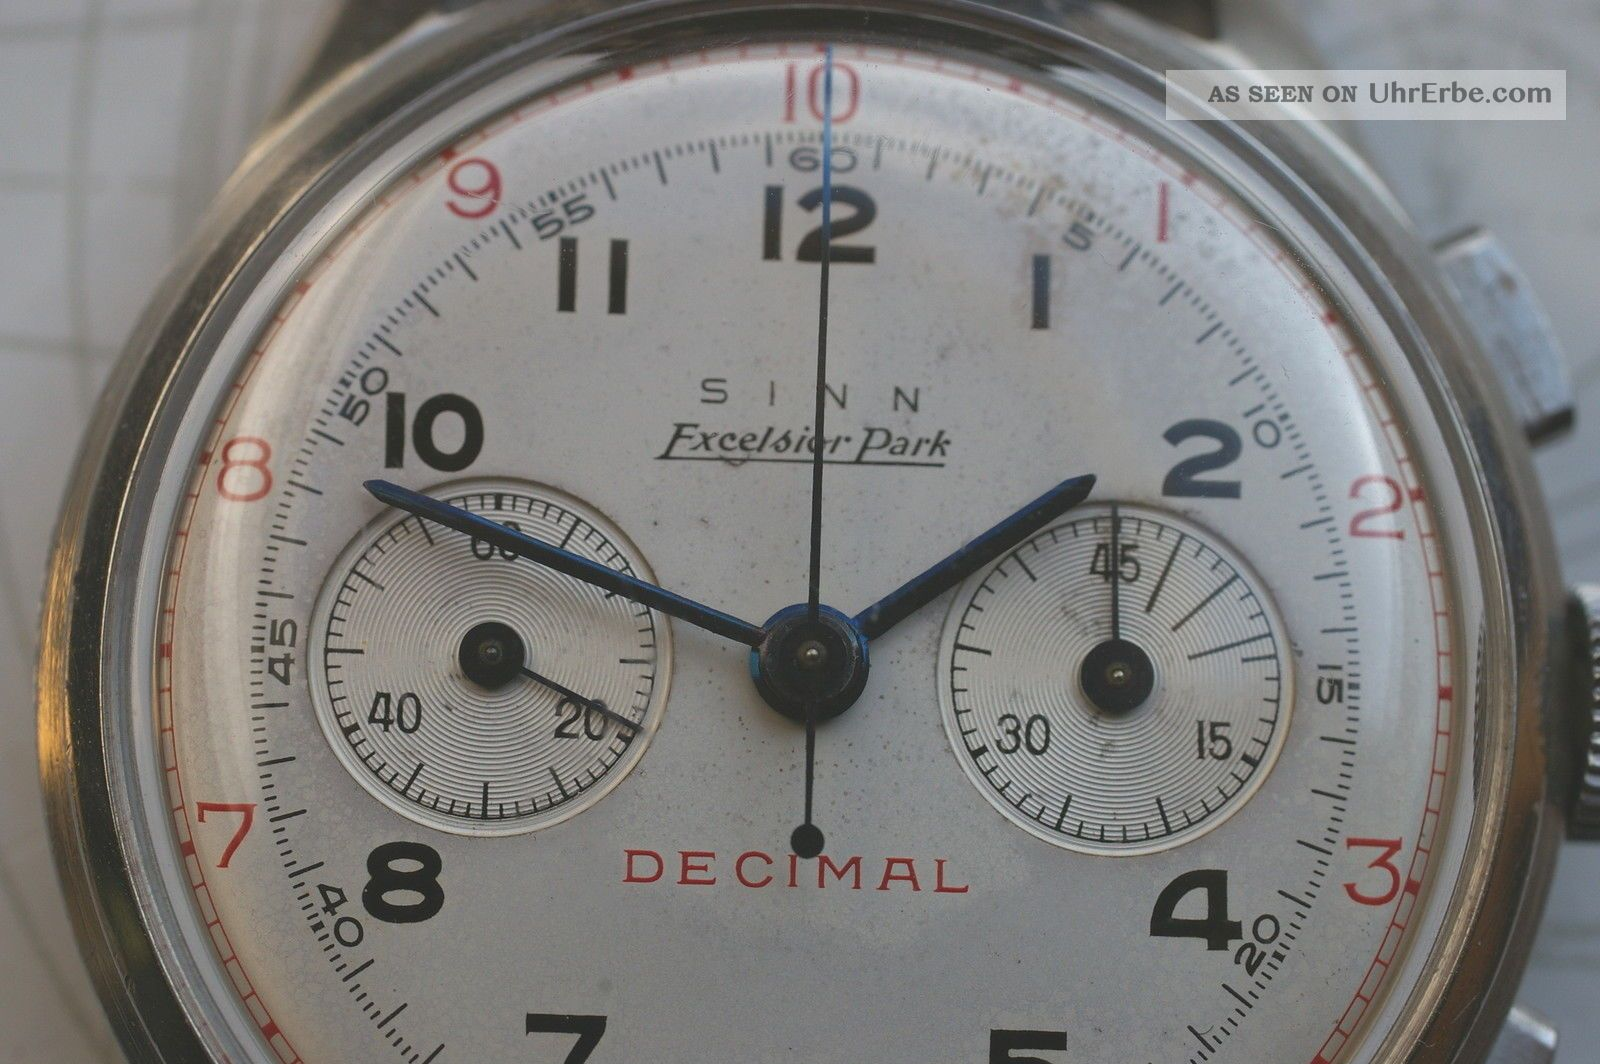 Sinn Excelsior Park Chronograph